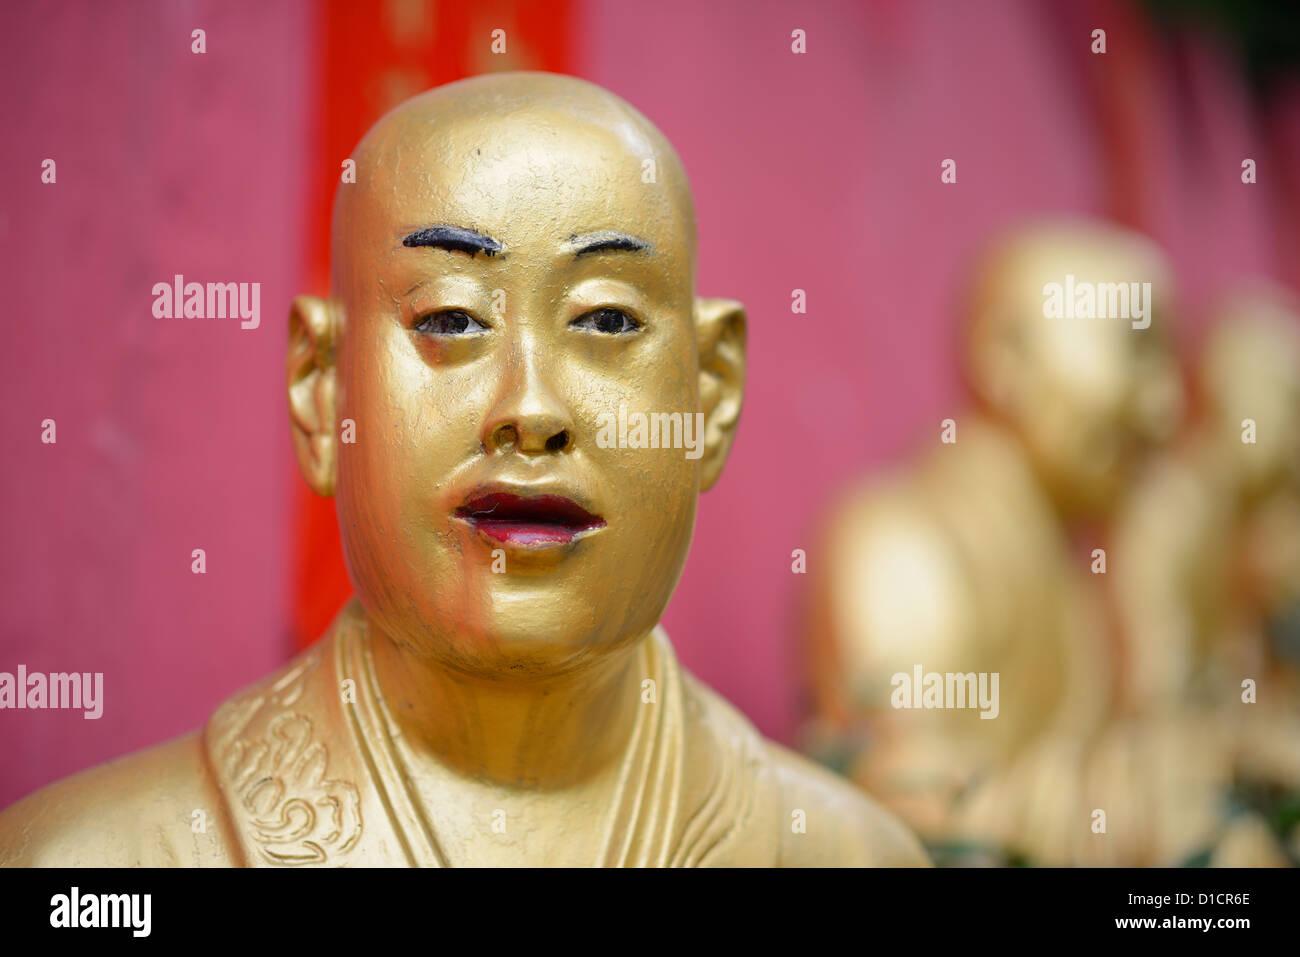 october 14: Statues sat Ten Thousand Buddhas Monastery in Sha Tin, Hong Kong, China. - Stock Image